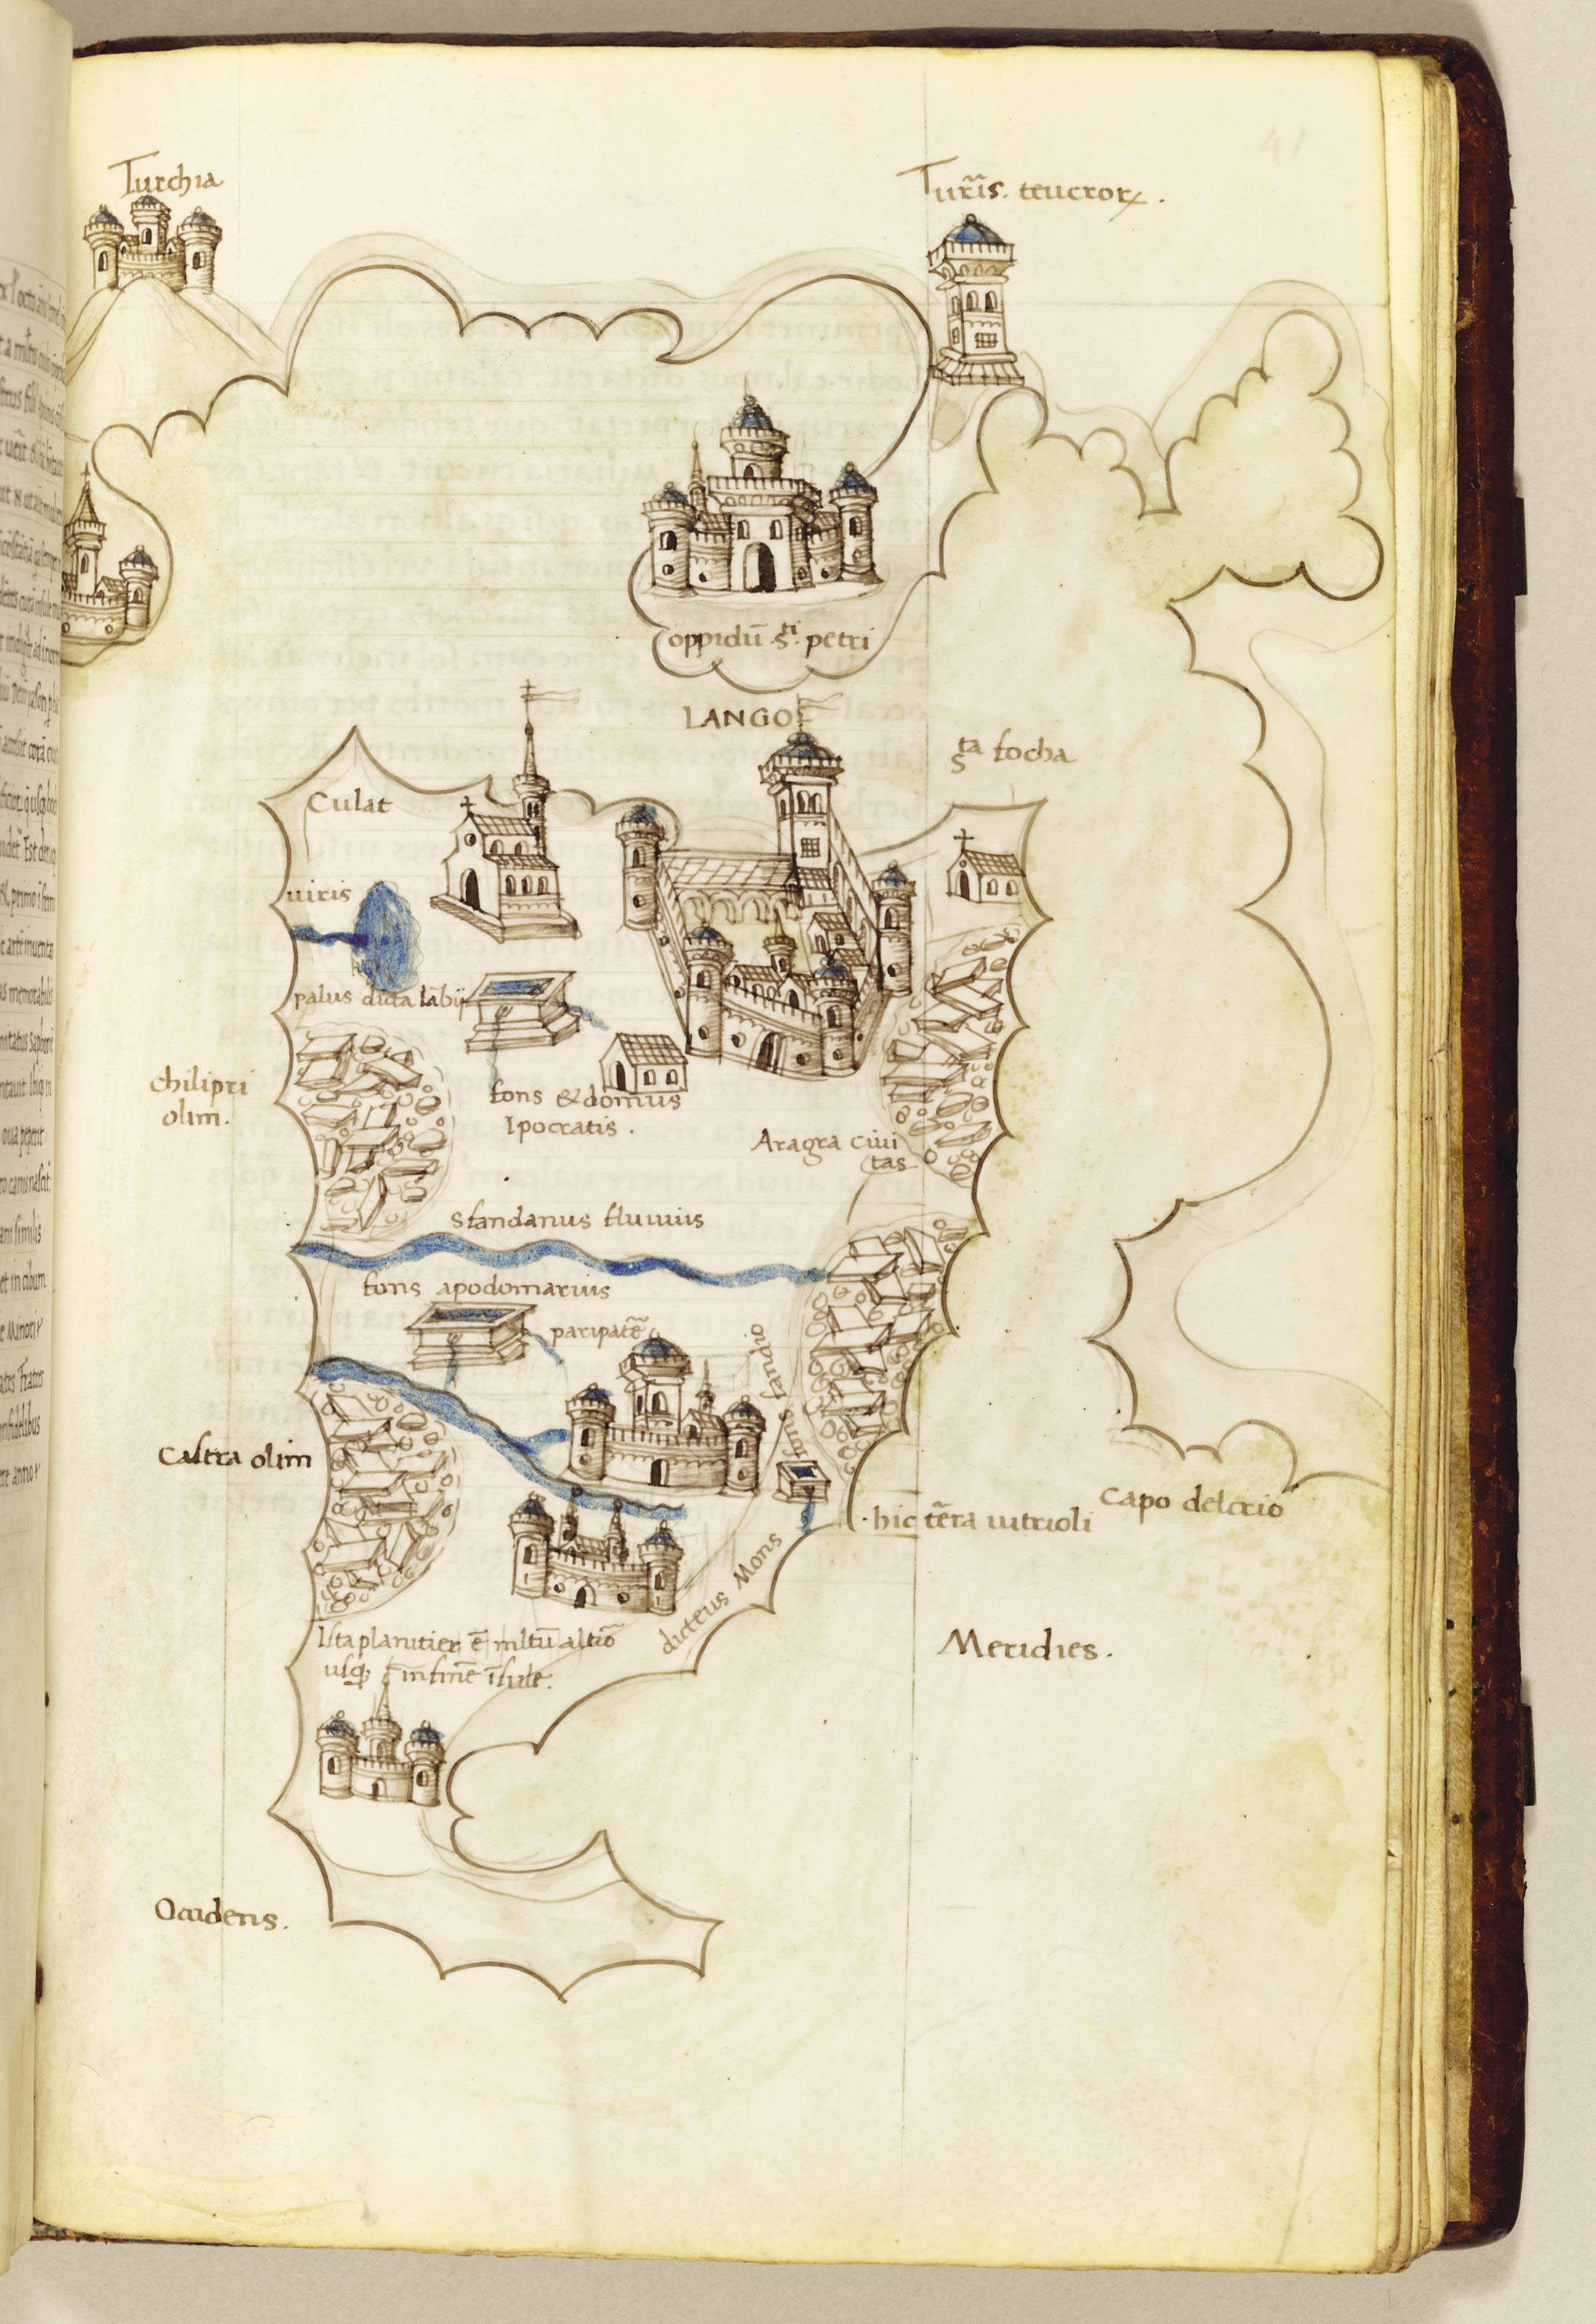 BUONDELMONTI, Cristoforo (Florence c. 1385-not before 1430 probably Greece). Liber Insularum Archipelagi. ILLUMINATED MANUSCRIPT ON VELLUM, in Latin. [Italy, perhaps Florence, c. 1450].